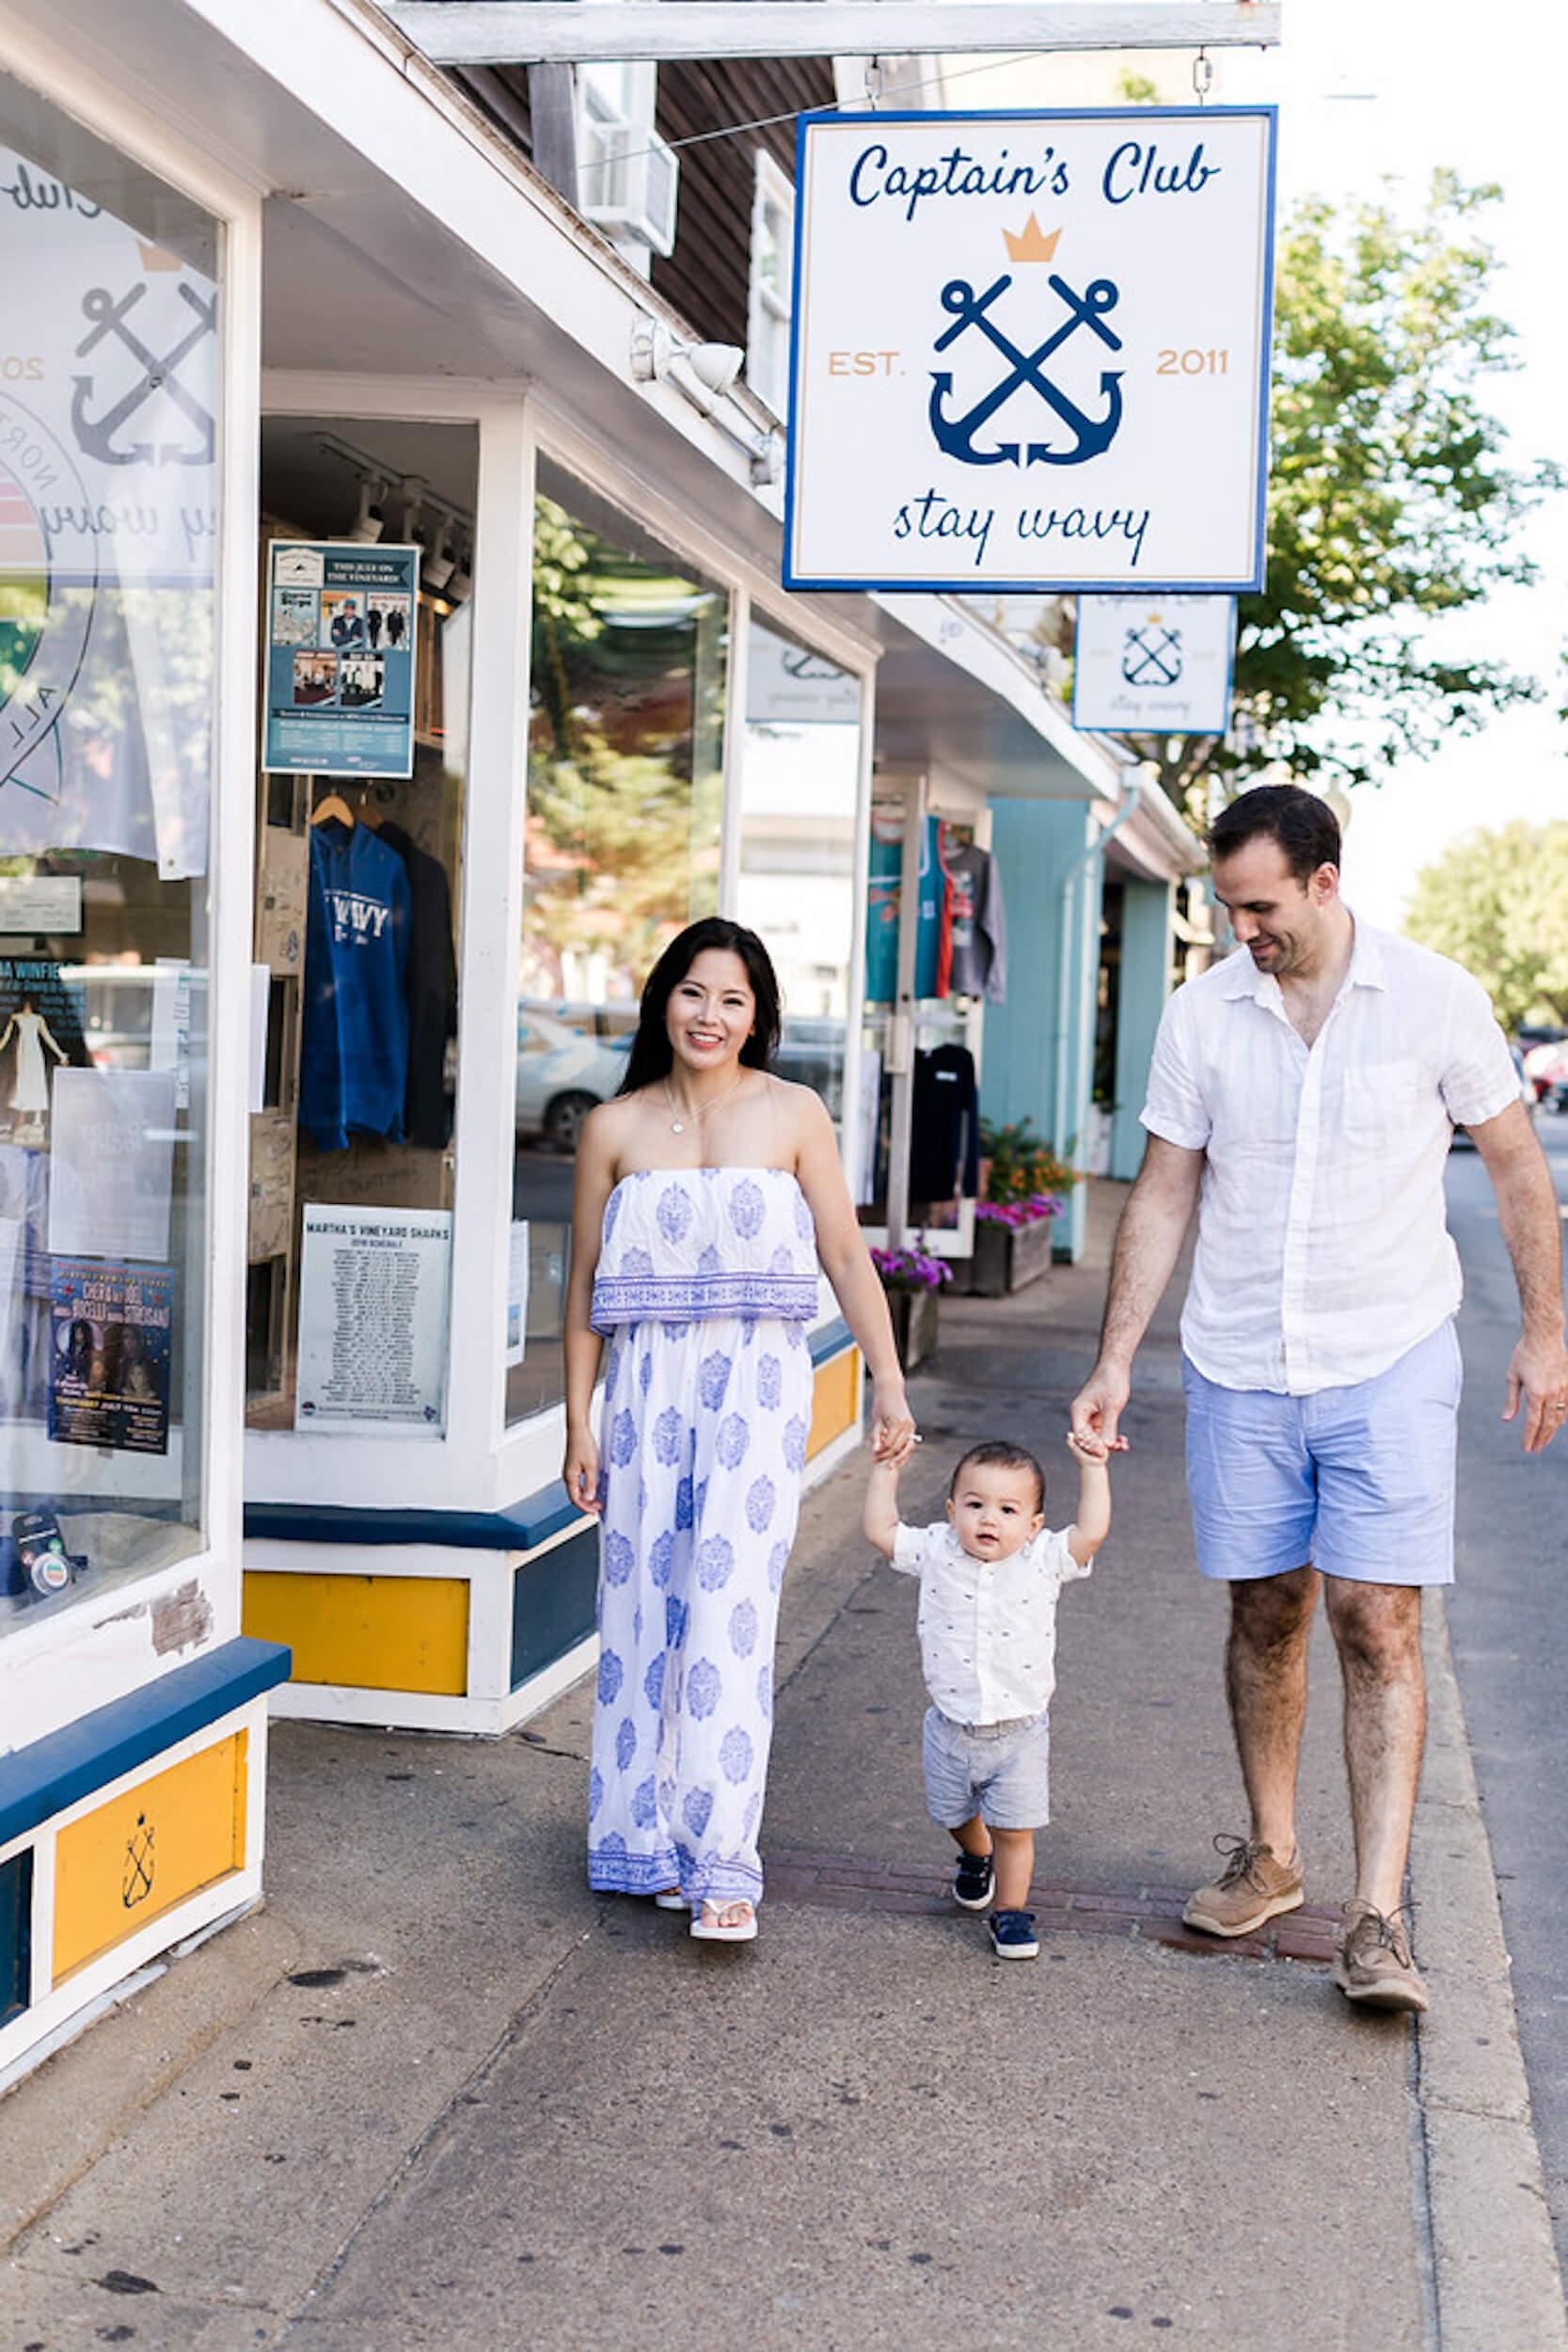 A happy family walks down Main Street in Martha's Vineyard, Massachusetts, USA.